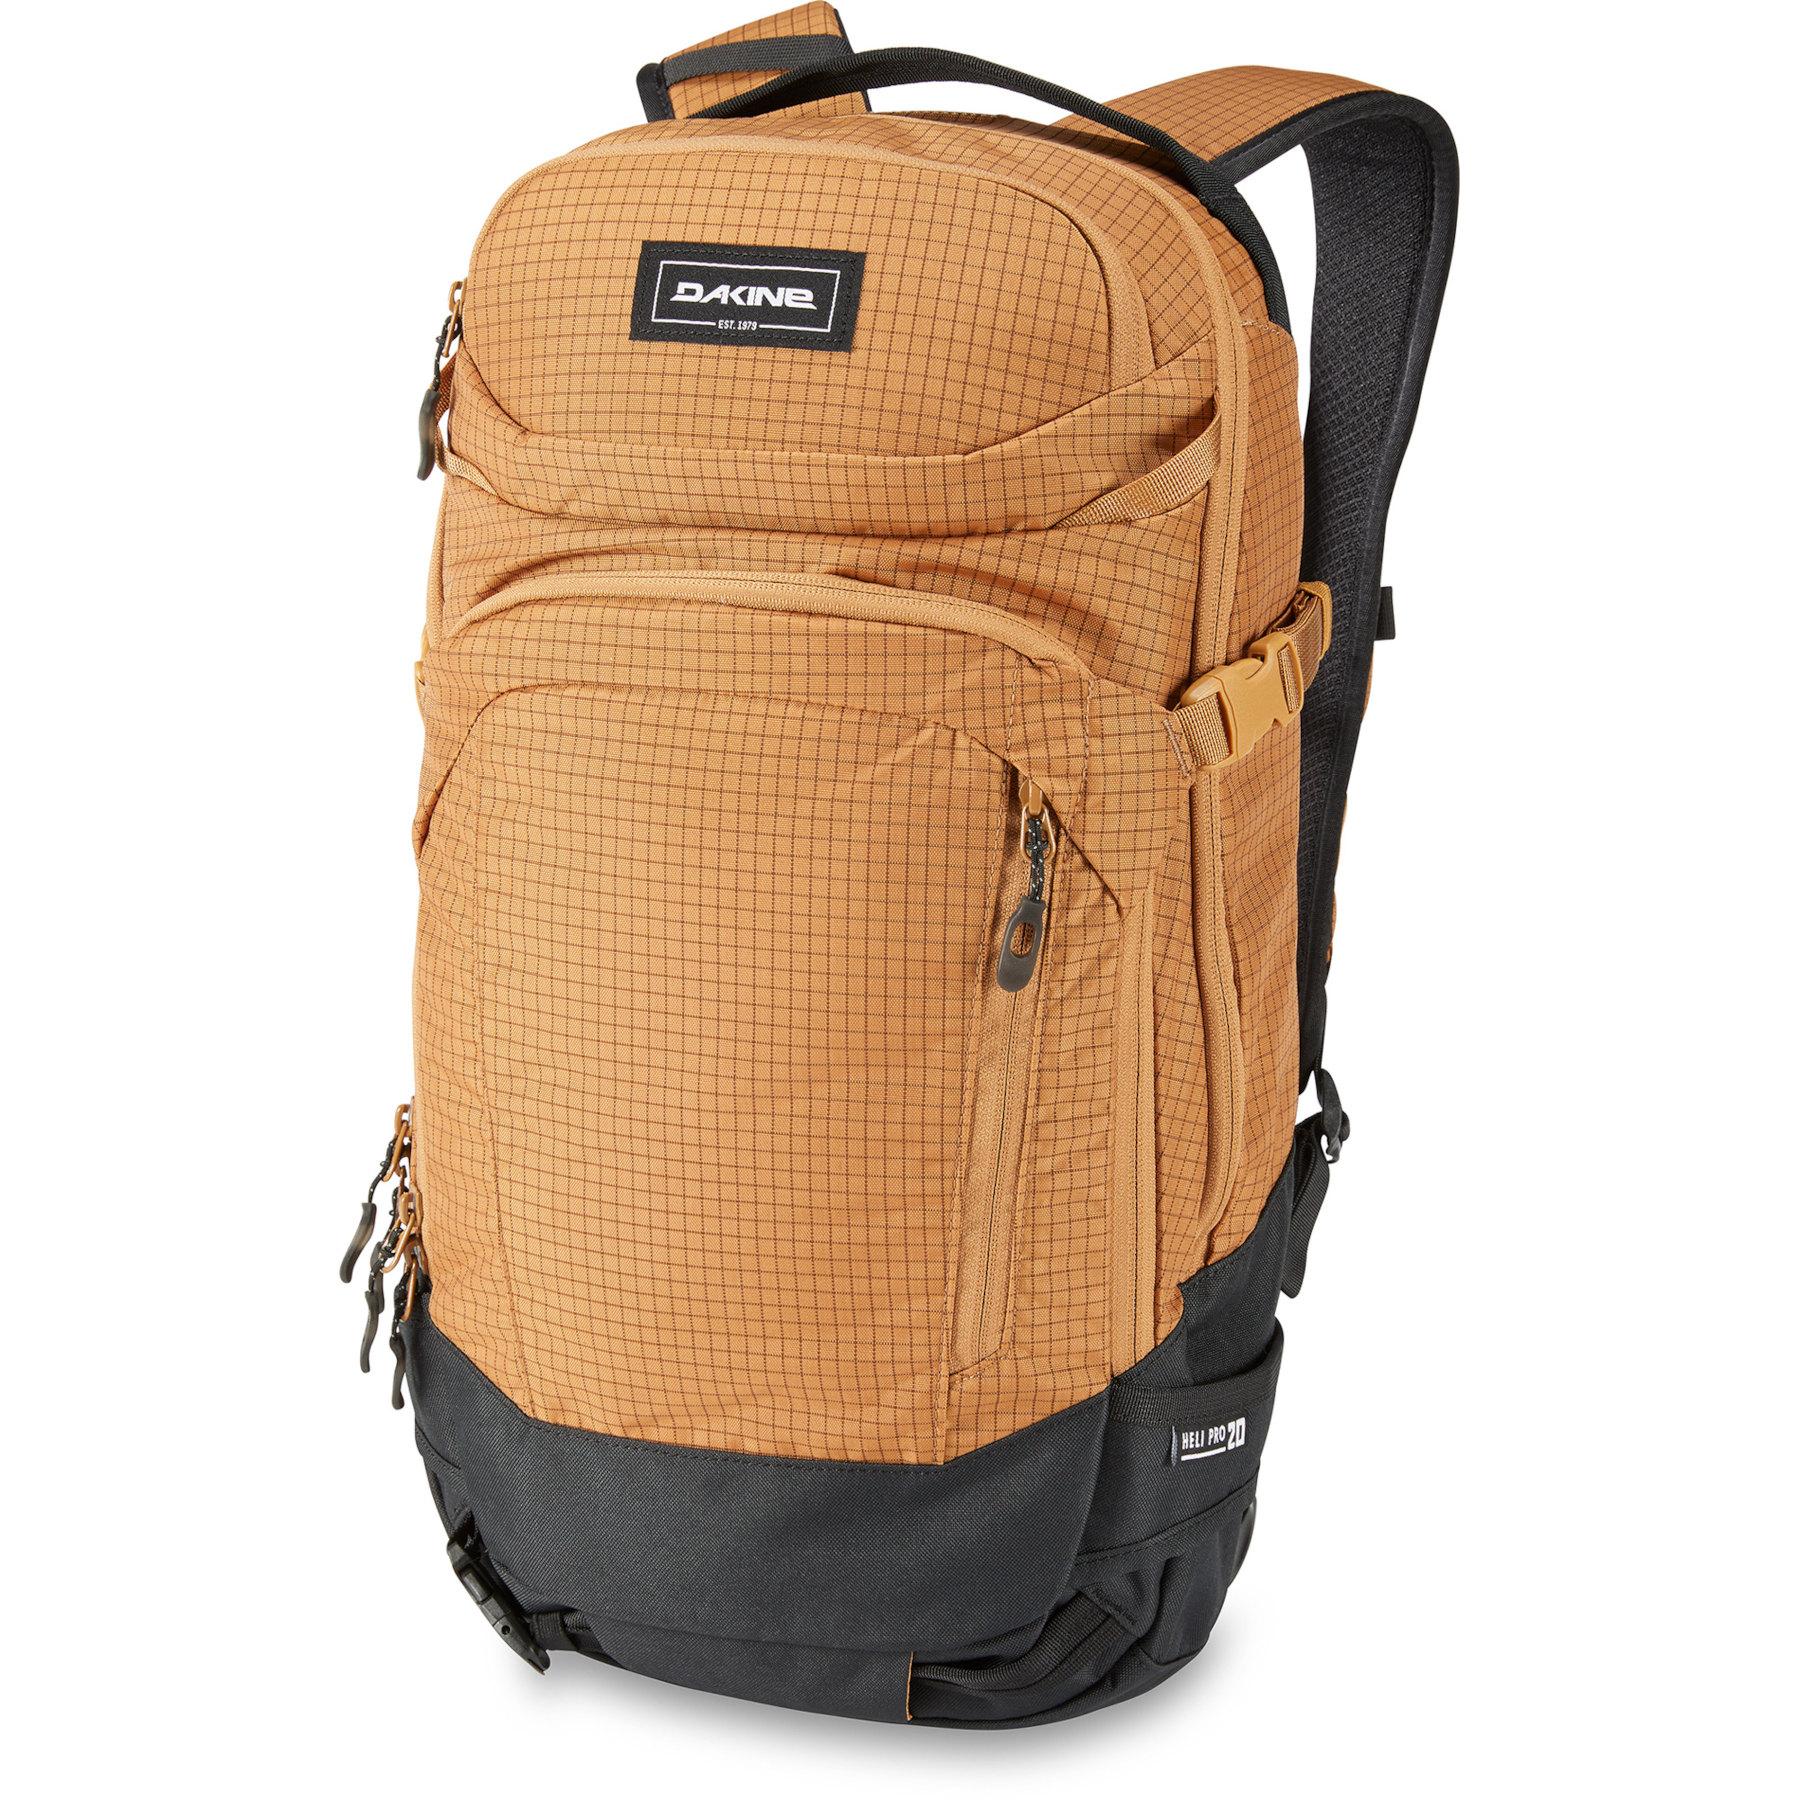 Dakine Heli Pro 20L Backpack - Caramel